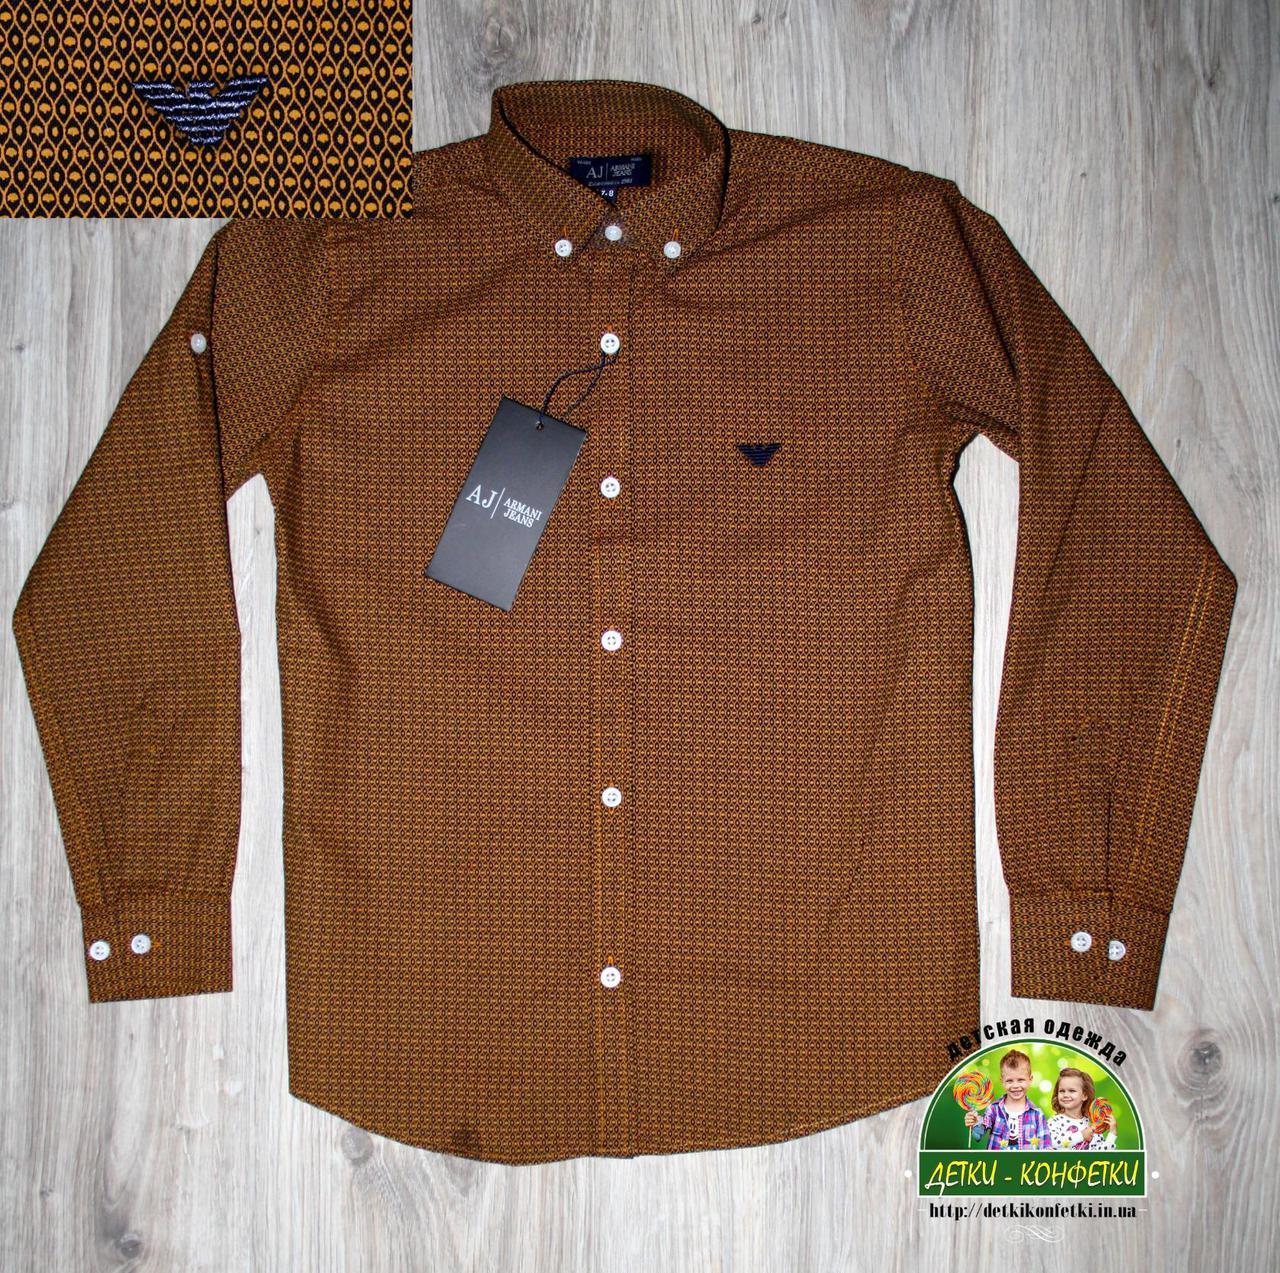 b99f3447149f Коричневая рубашка ARMANI с длинным рукавом для мальчика: продажа, цена в  Запорожье. ...